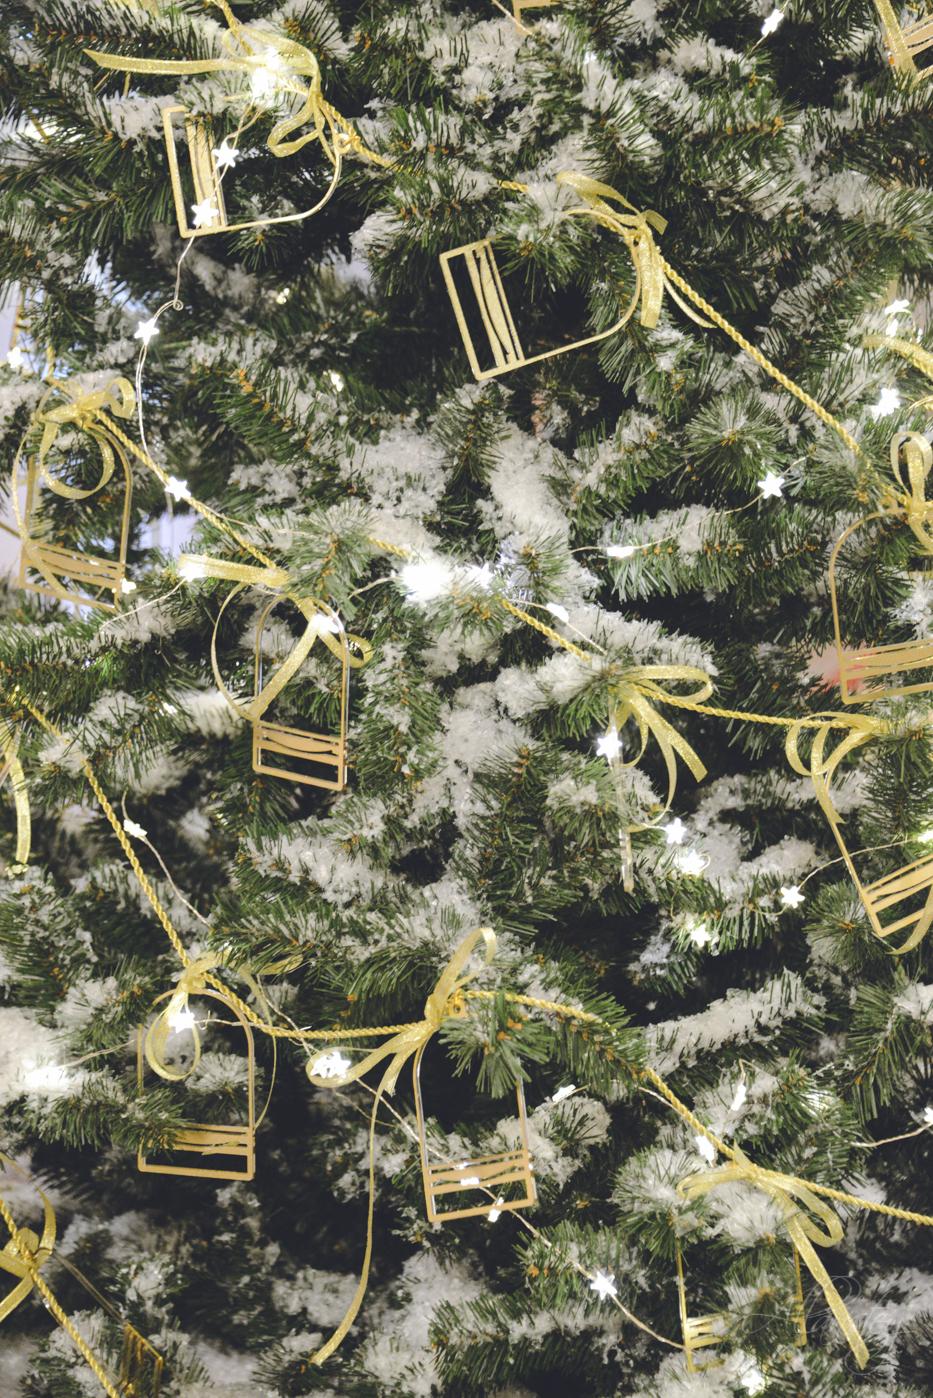 Christmas tree decorations closeup